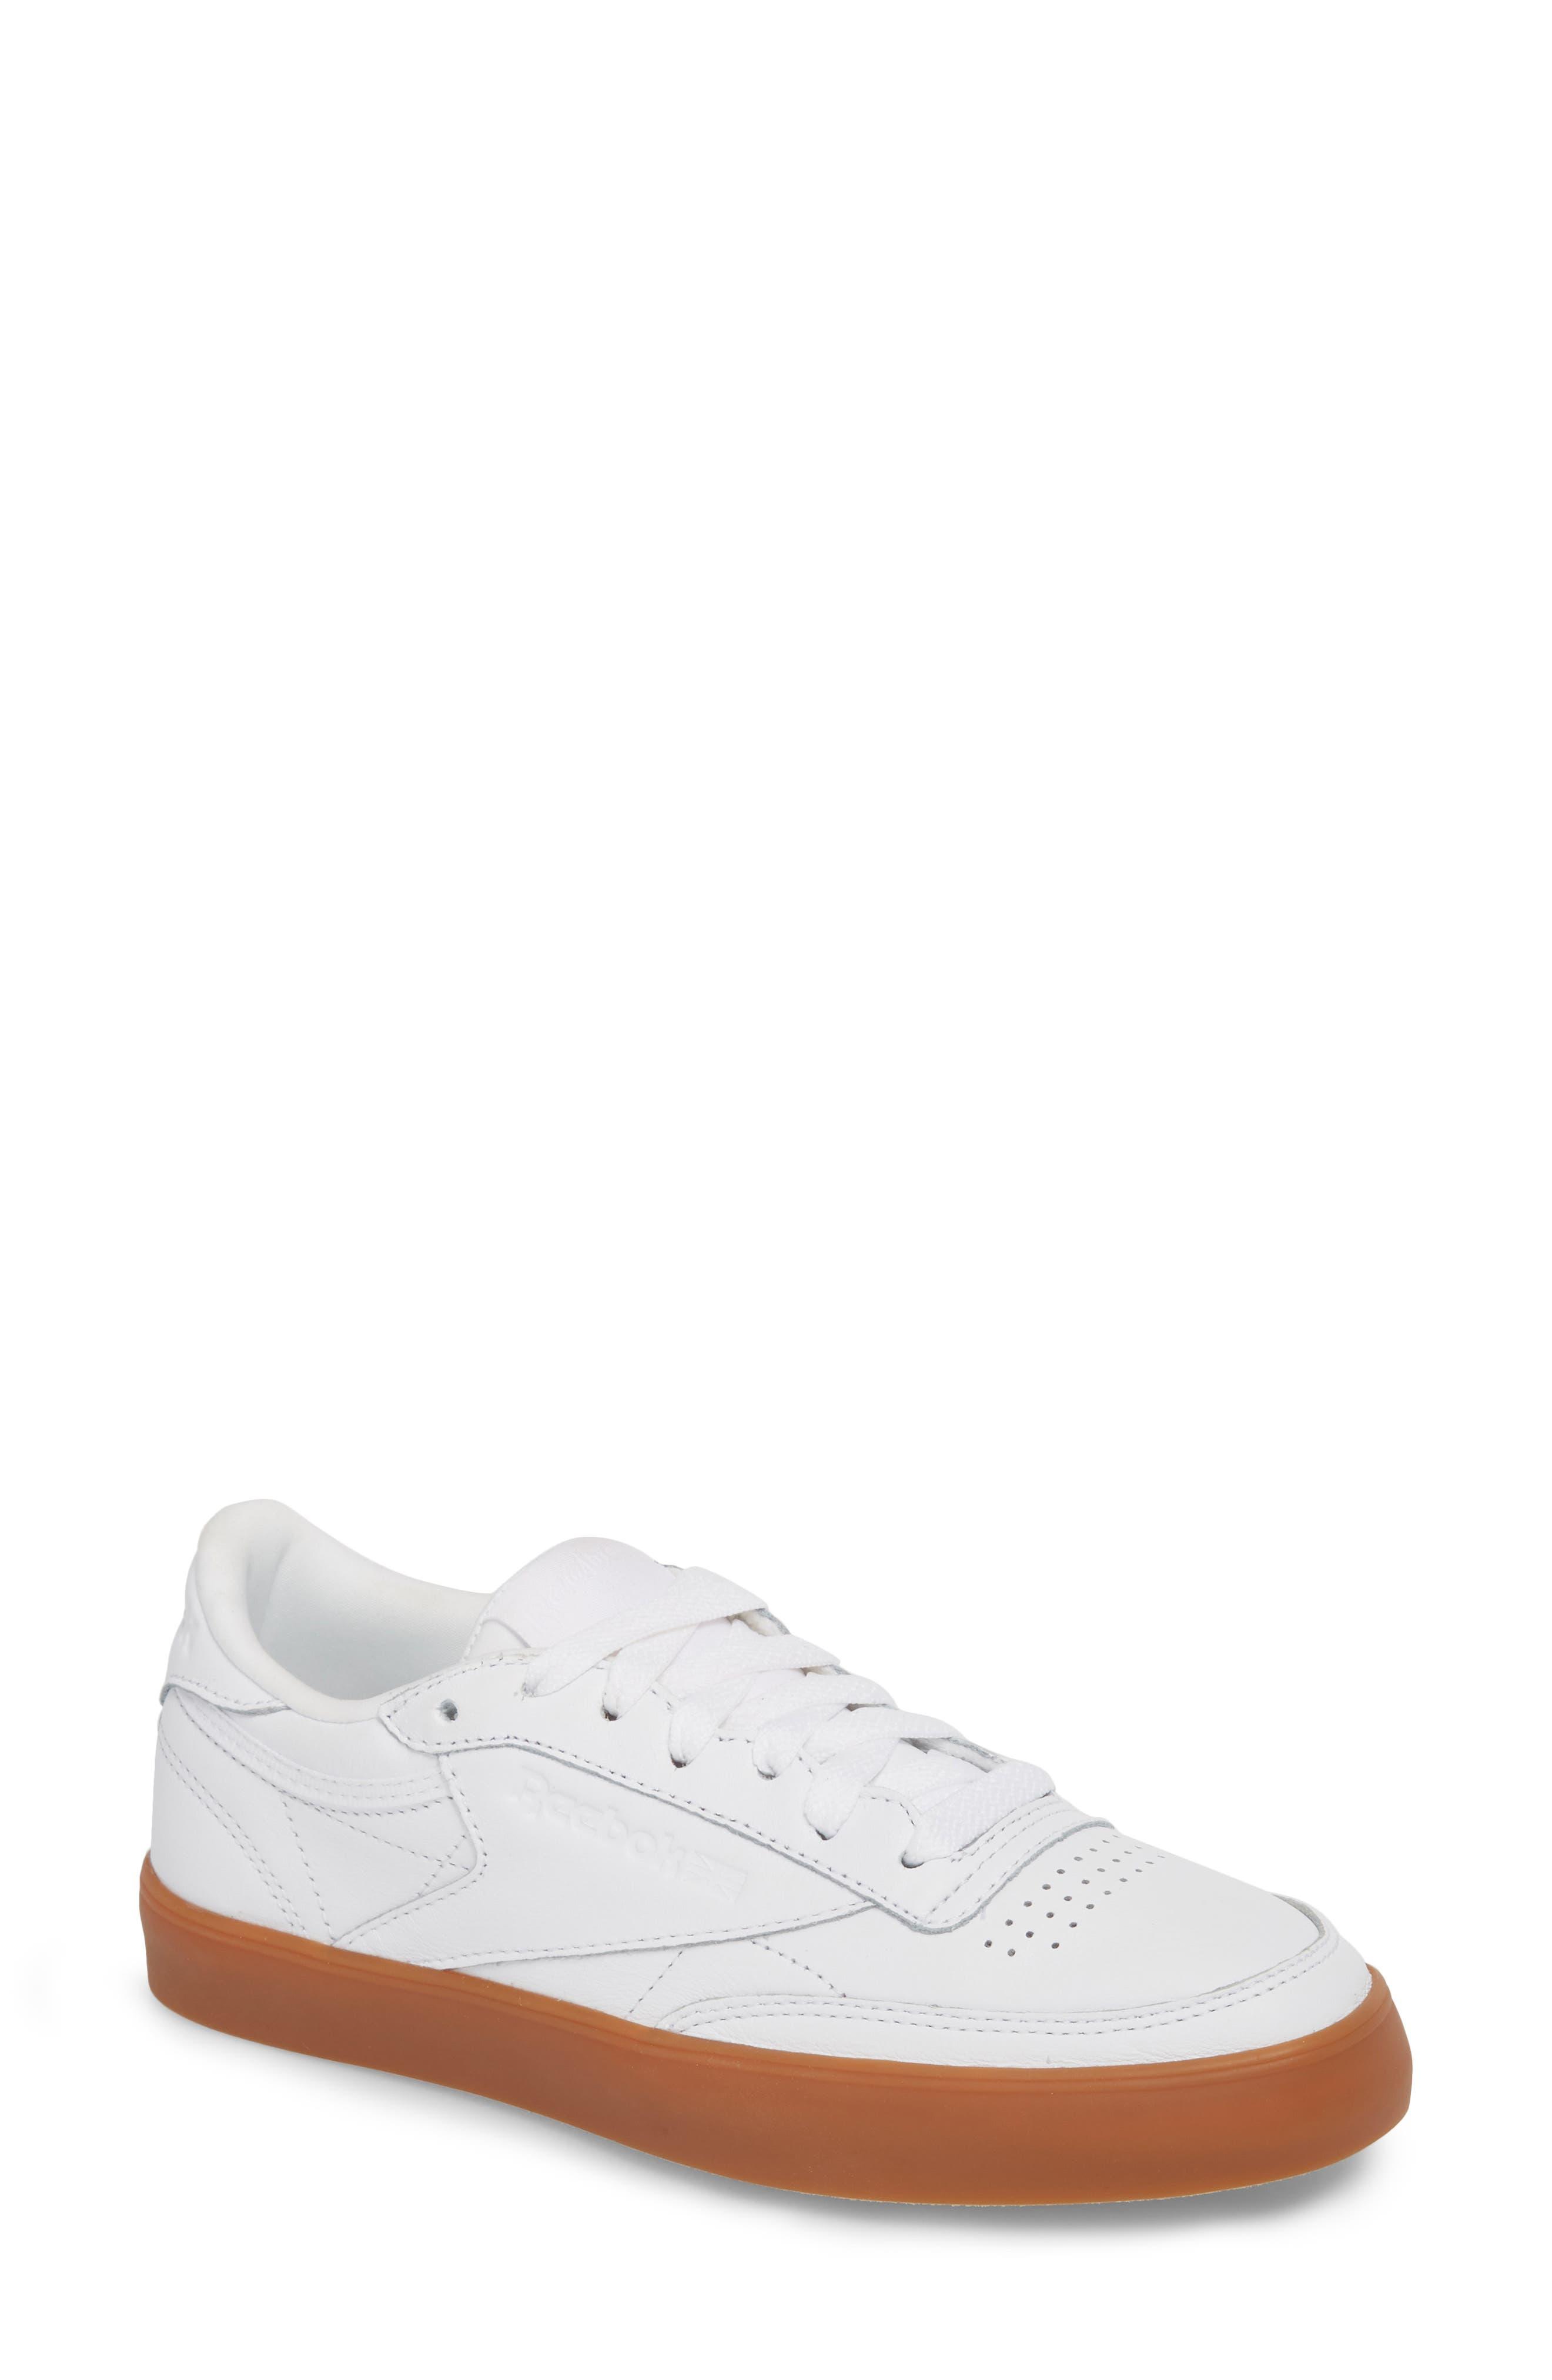 Main Image - Reebok Club C 85 Sneaker (Women)